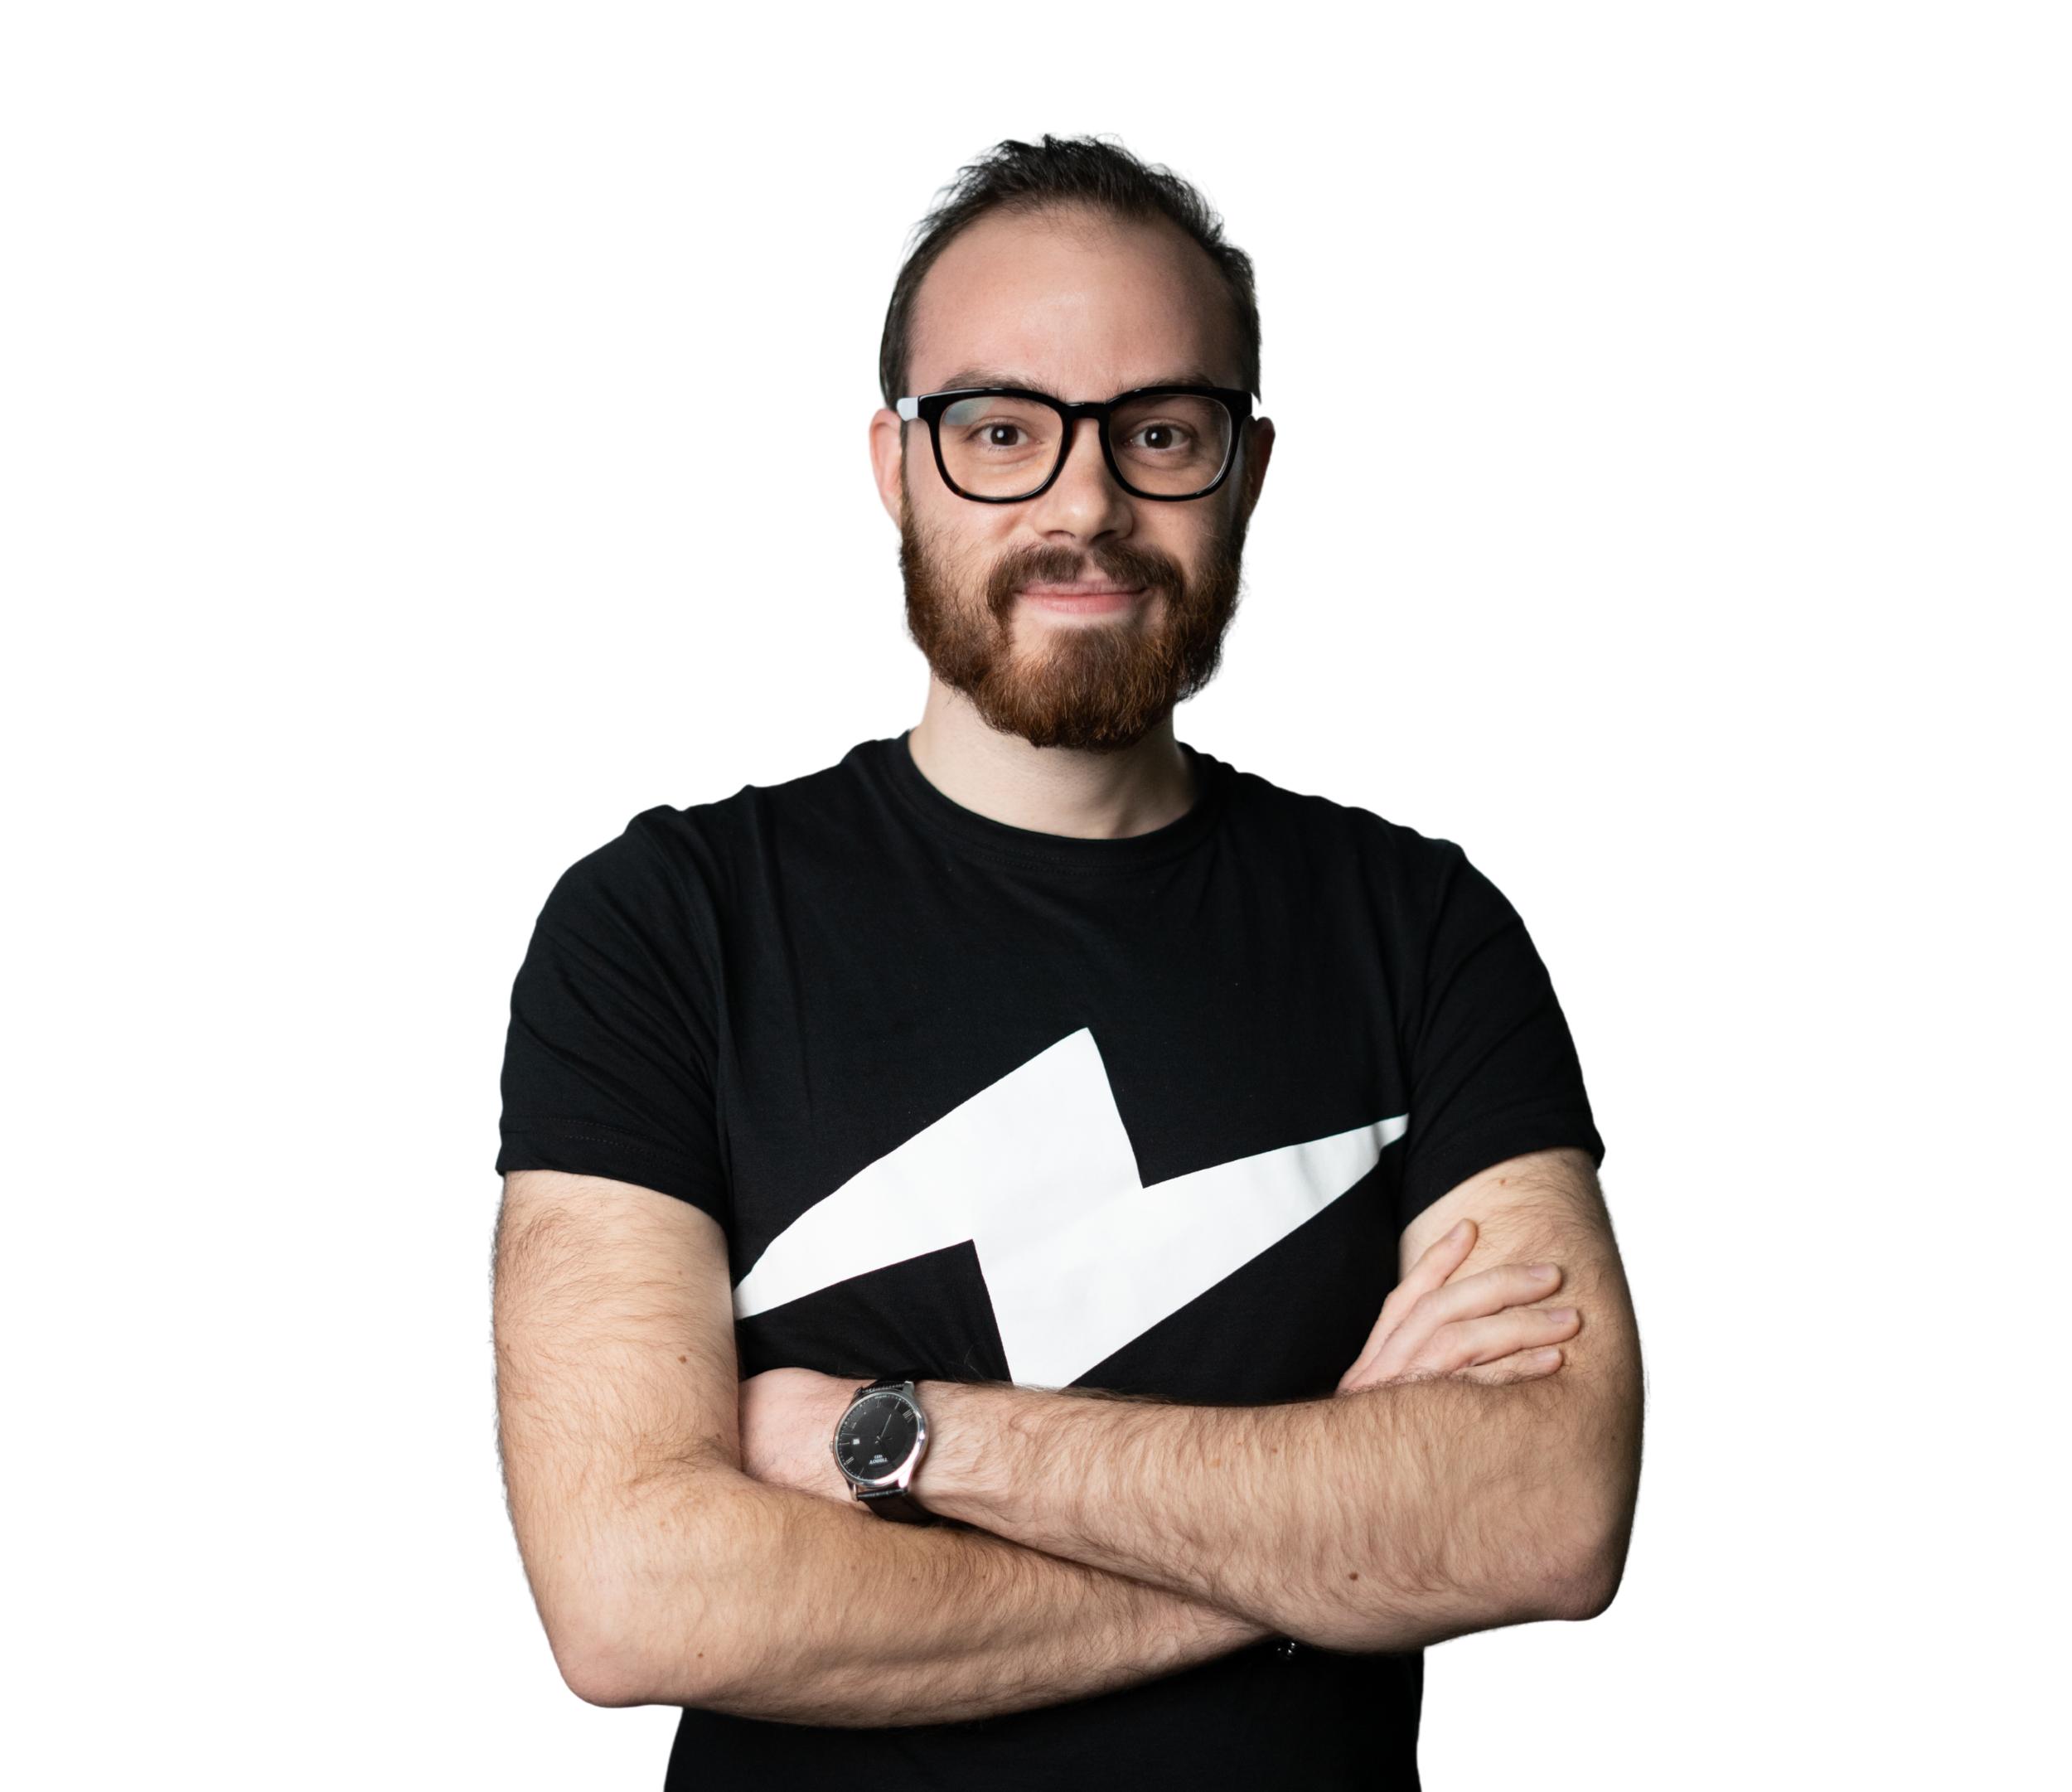 Francesco Pastoressa Marketing Manager Voxloud